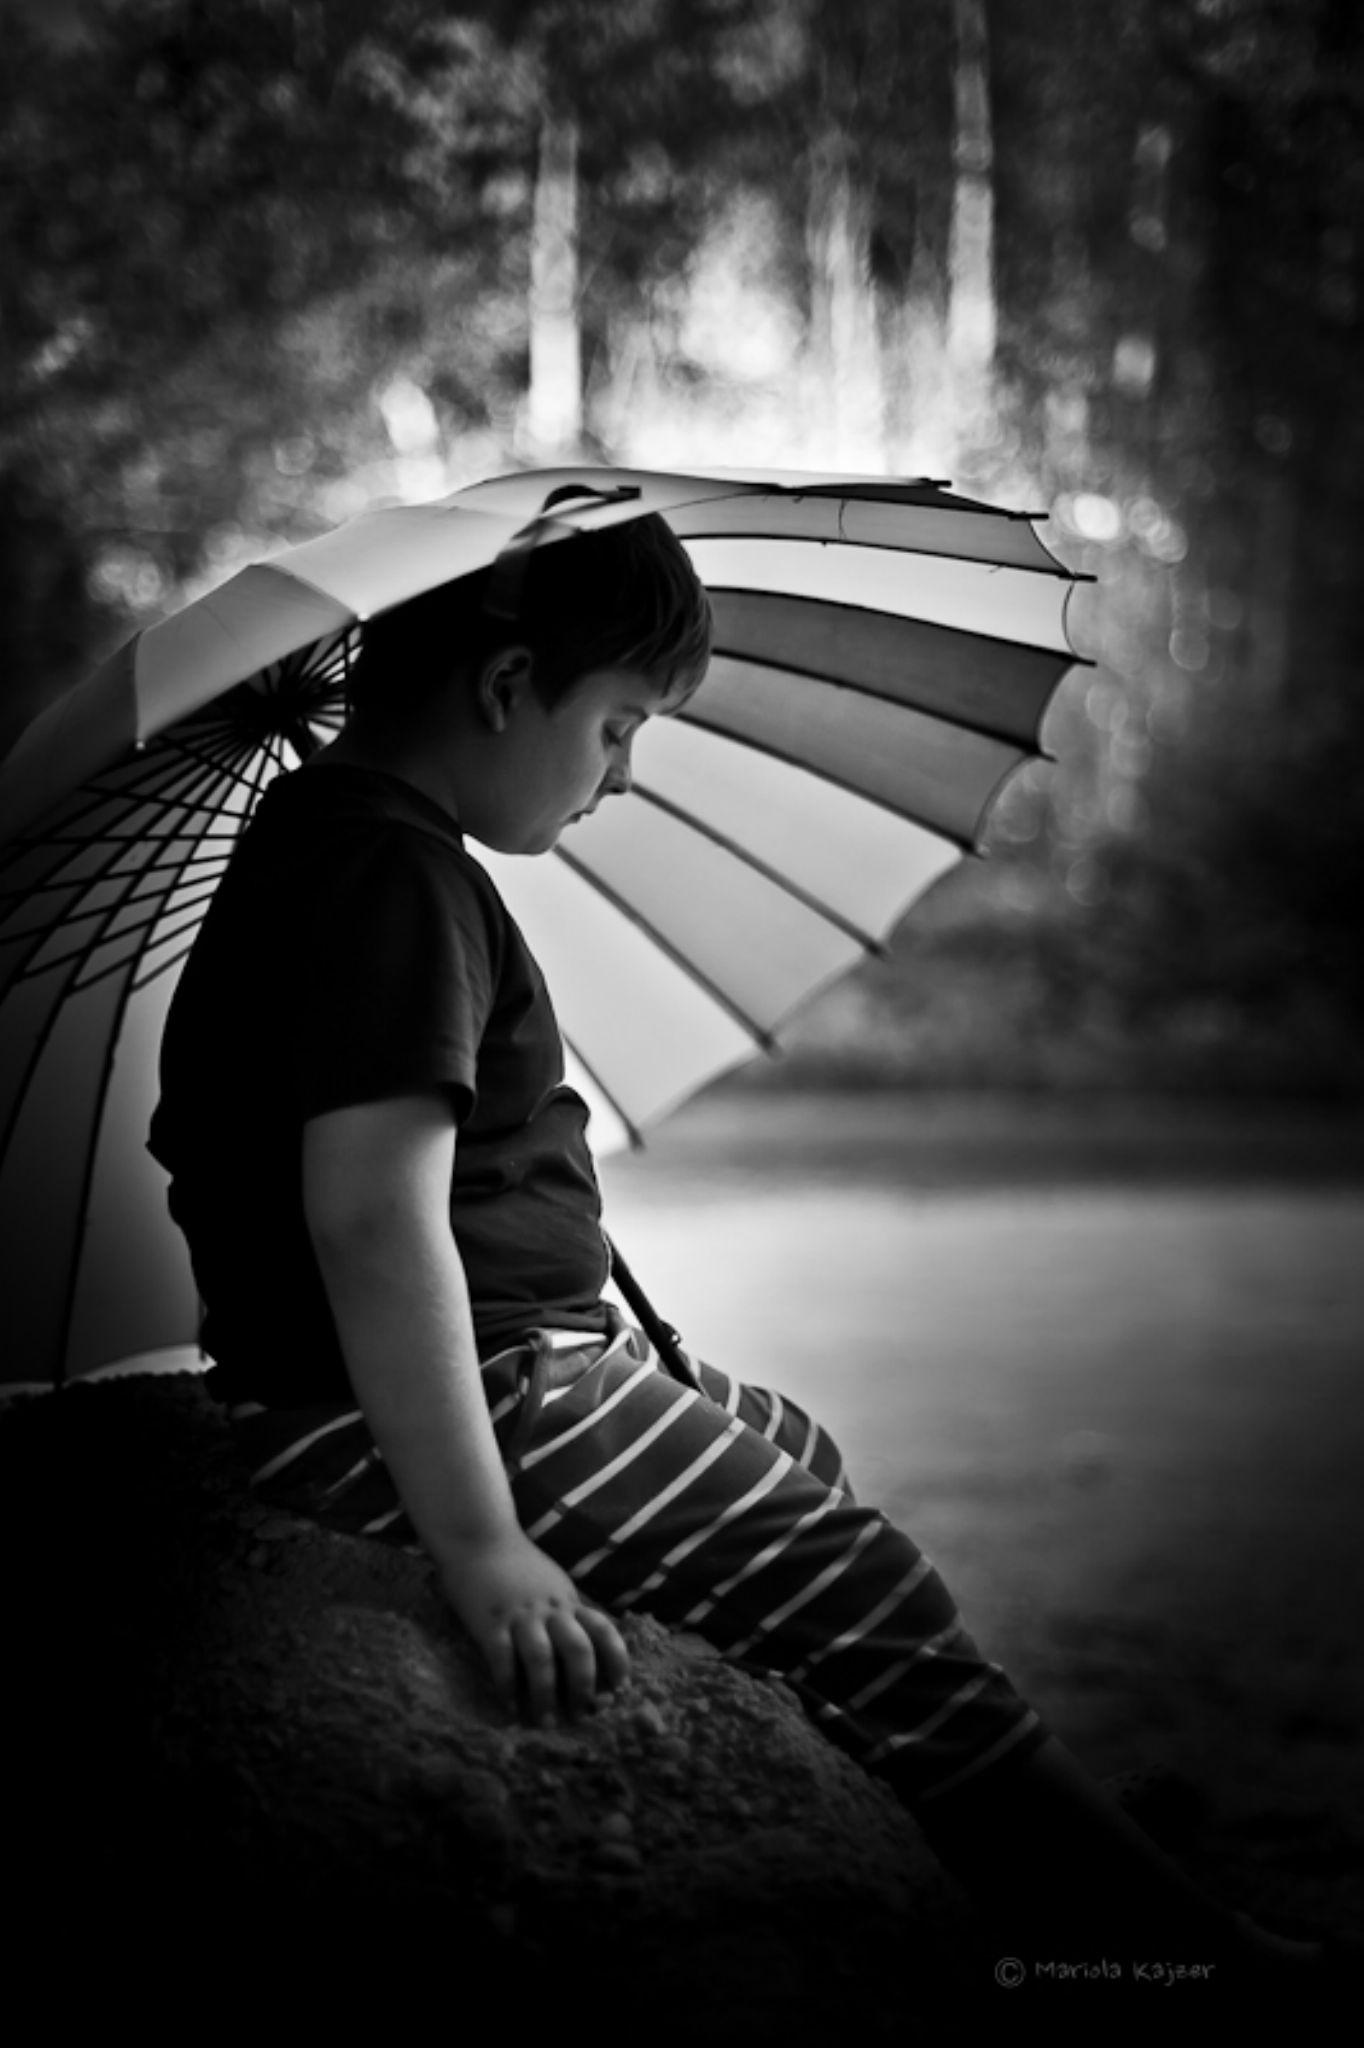 waiting for rain by mariola.kajzer.1